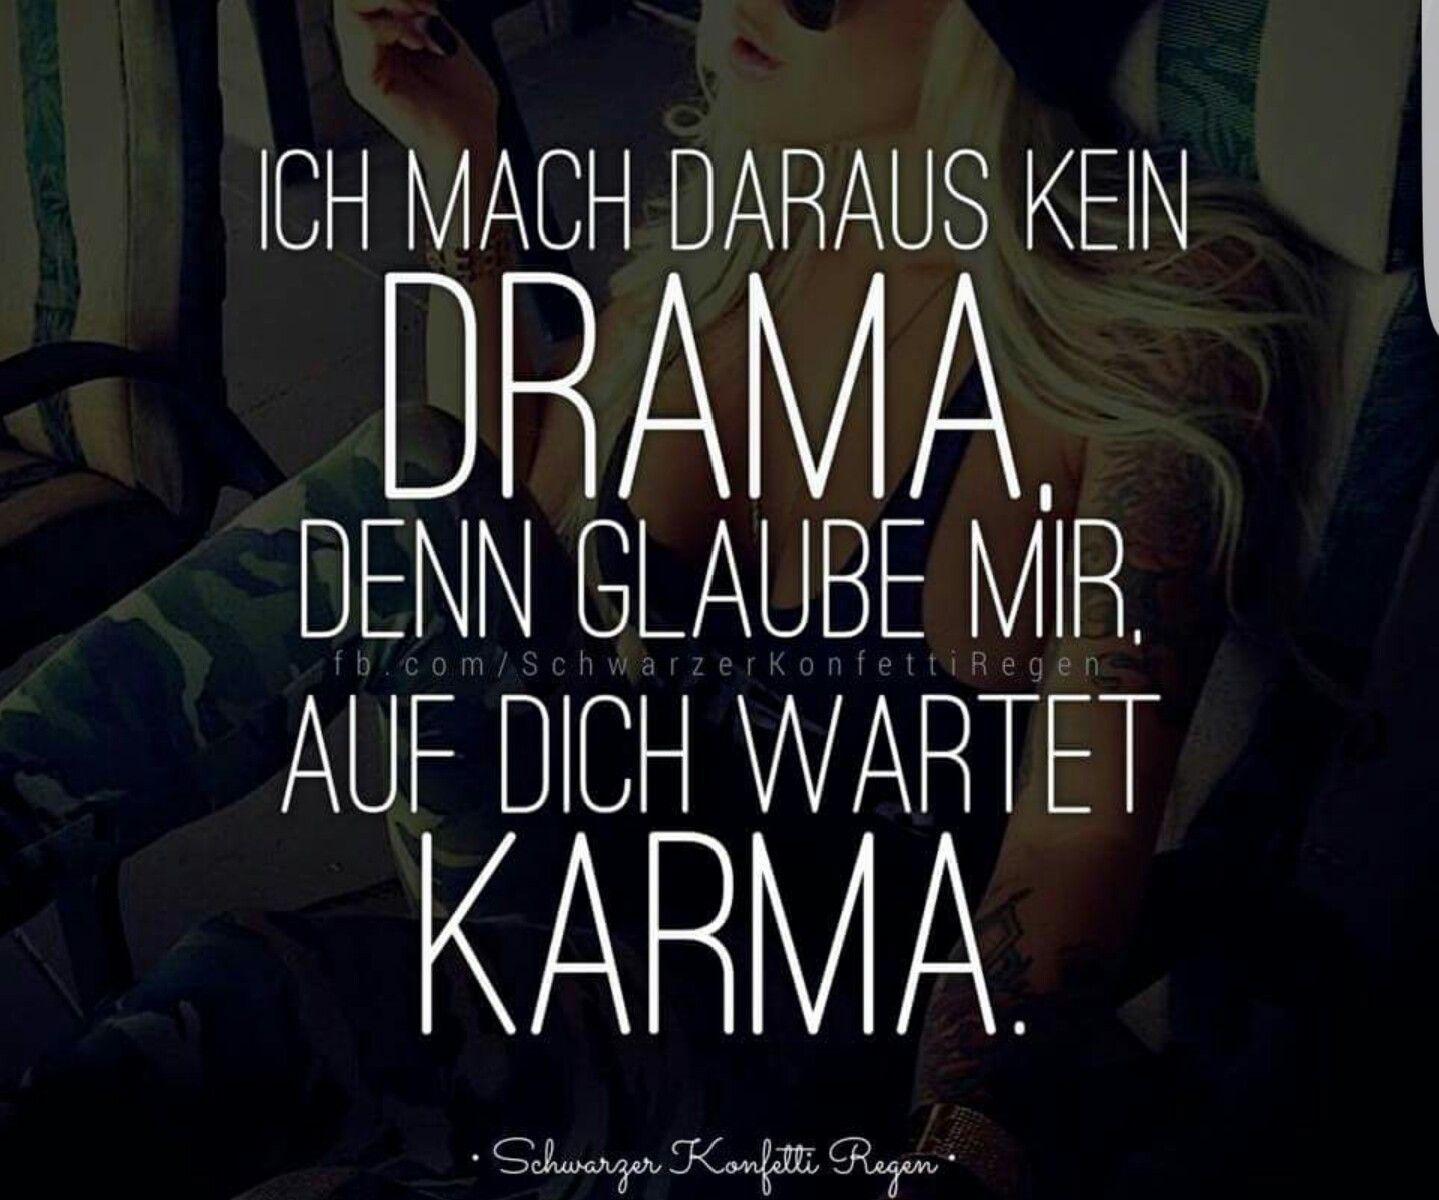 Ich mach daraus kein #Drama | Karma sprüche, Karma